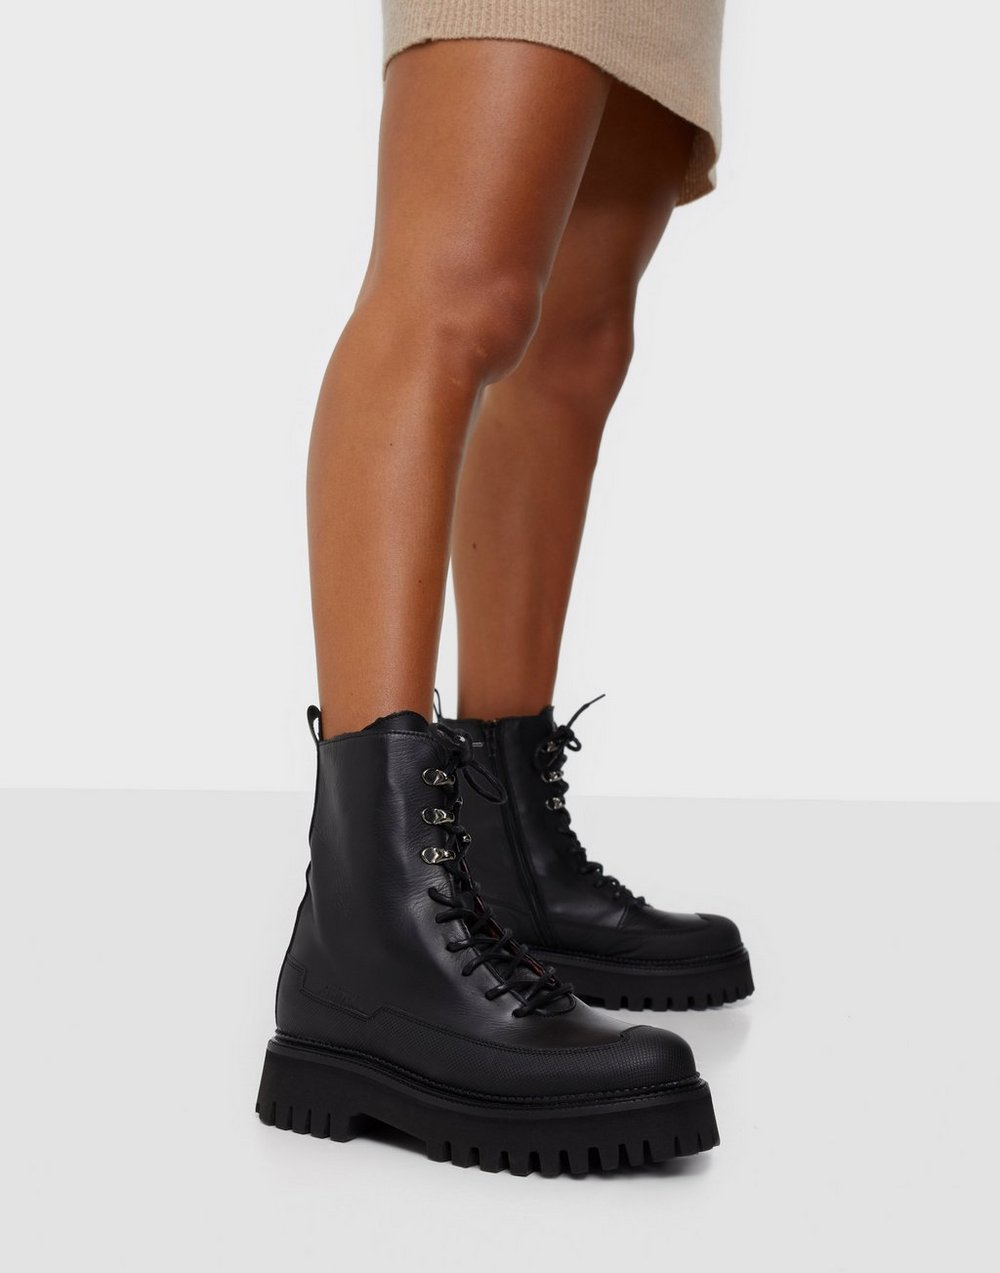 Bronx BX 1651 Groov y Flat Boots